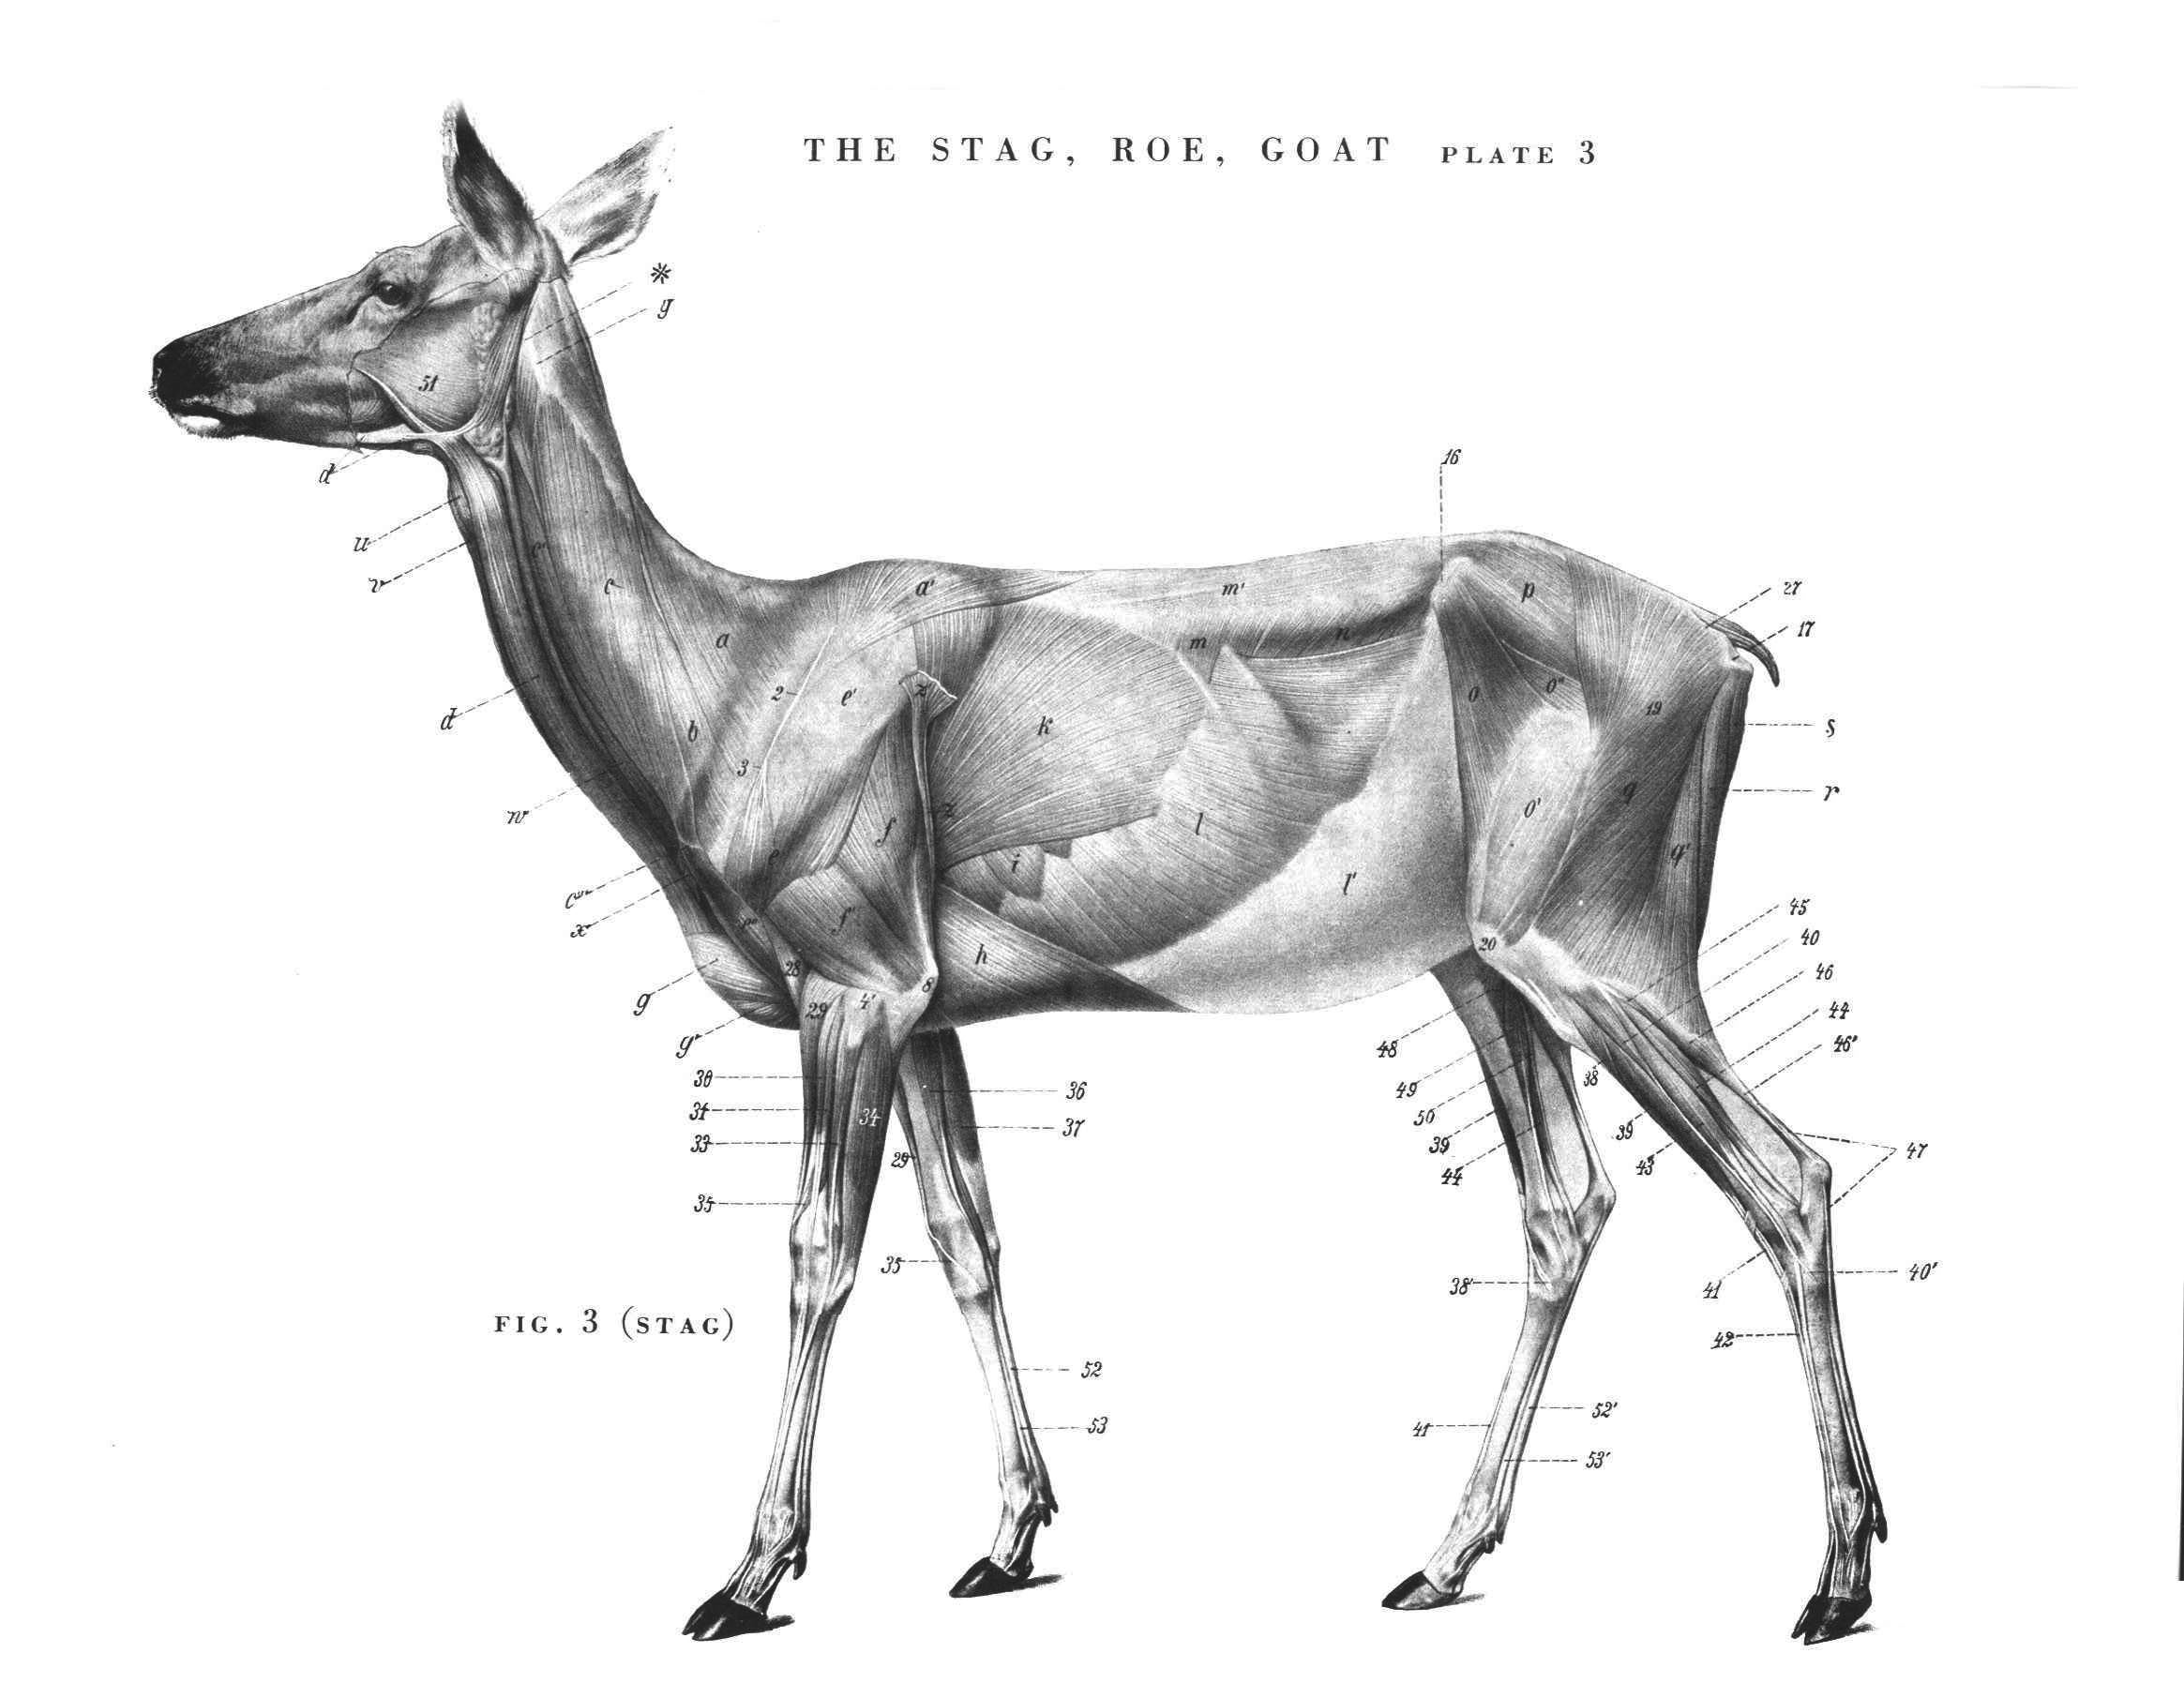 Atlas Of Animal Anatomy Image collections - human body anatomy